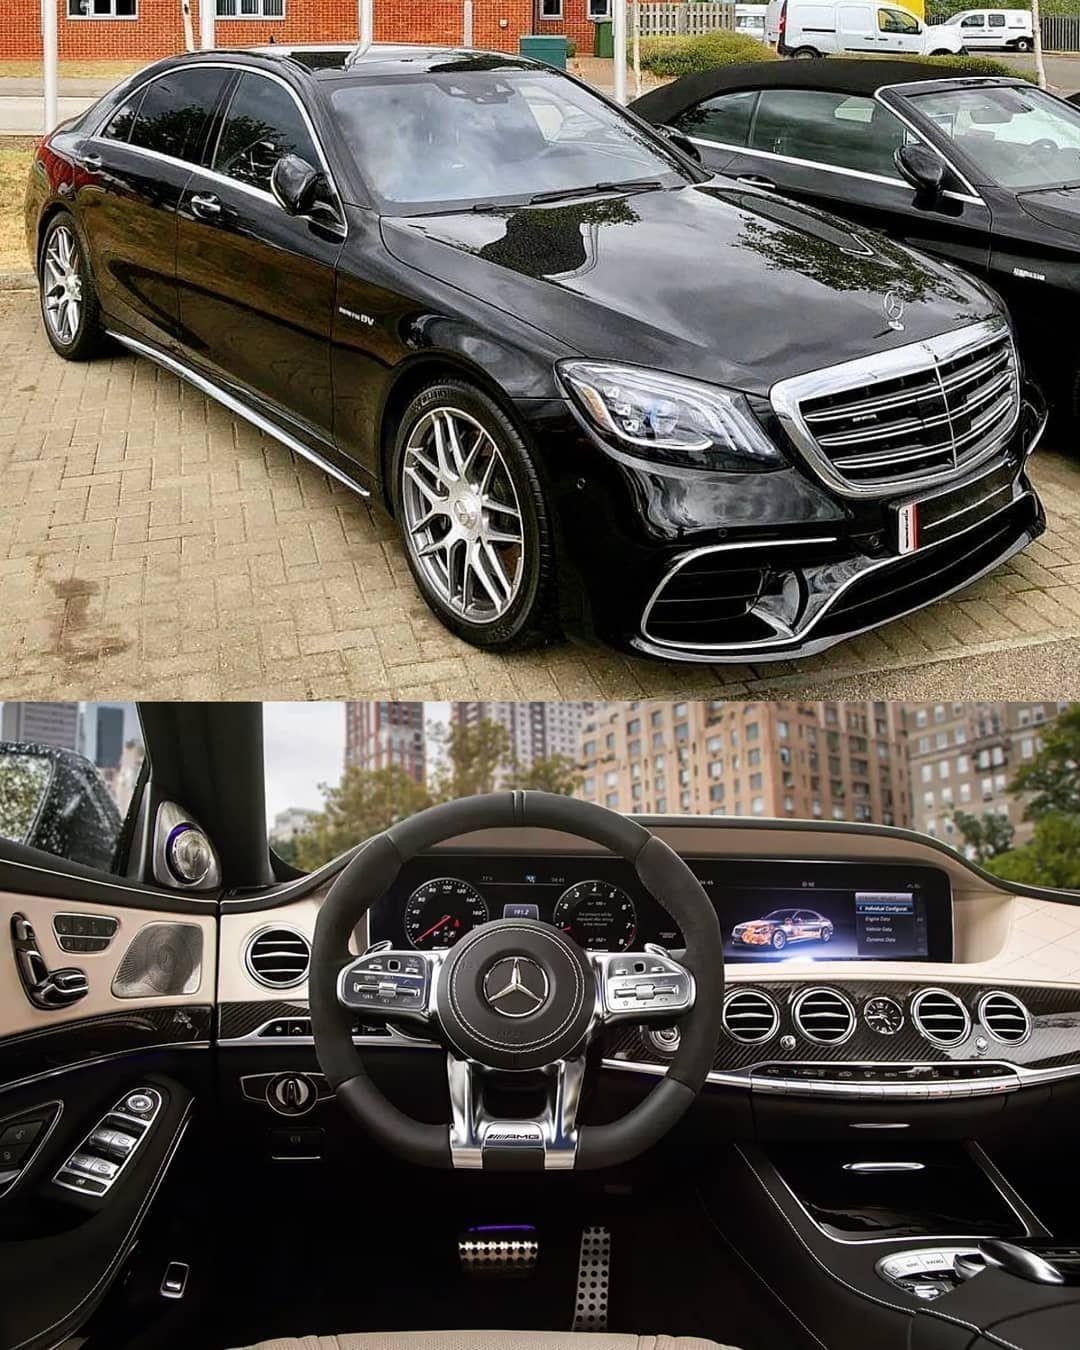 Image May Contain Car Mercedes Benz Mercedes Benz Cars